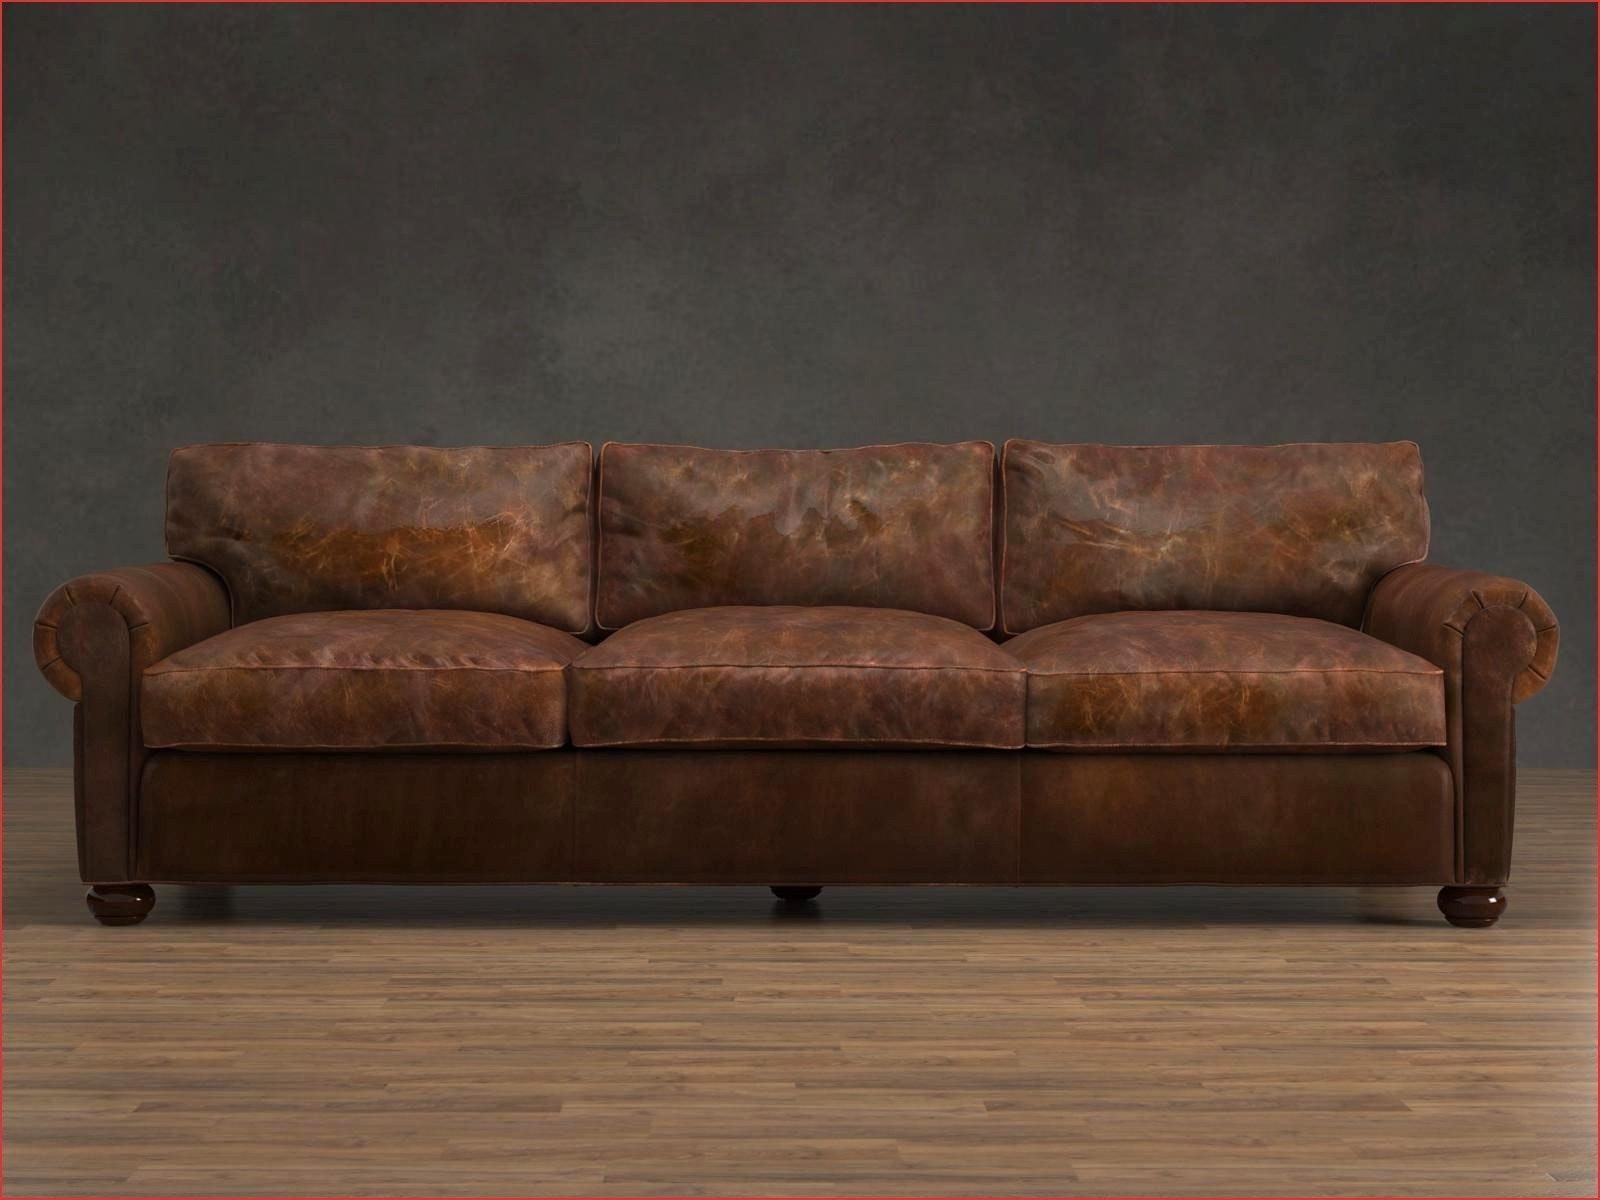 Craigslist Used Furnitureowner Kensington Sofa Wayfair Maxwell Within Preferred Craigslist Leather Sofas (View 17 of 20)